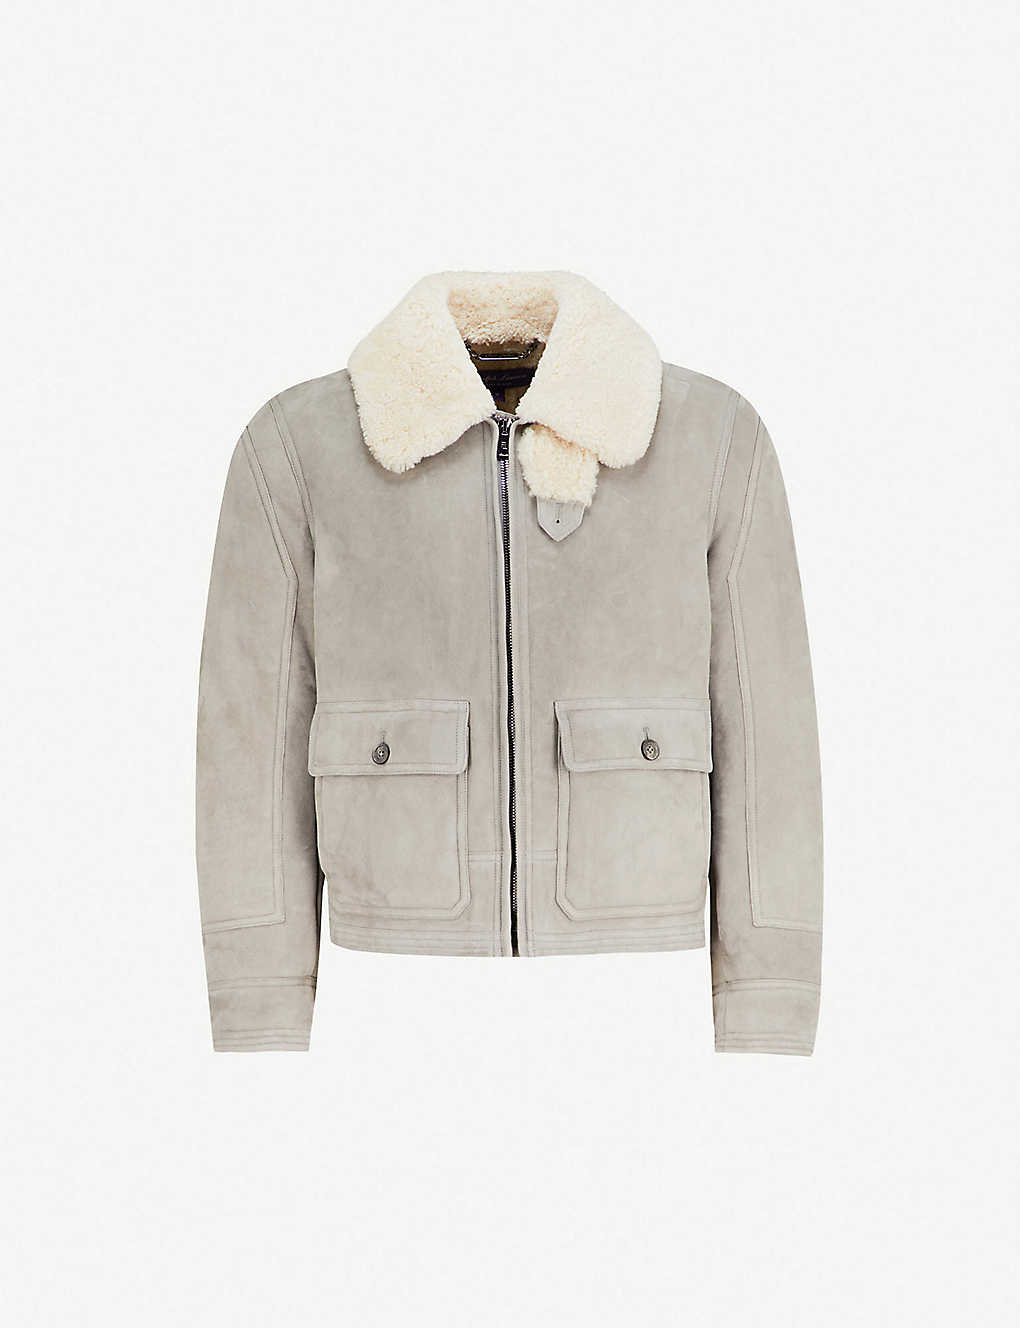 edb0ed4a092b RALPH LAUREN PURPLE LABEL - Shearling jacket